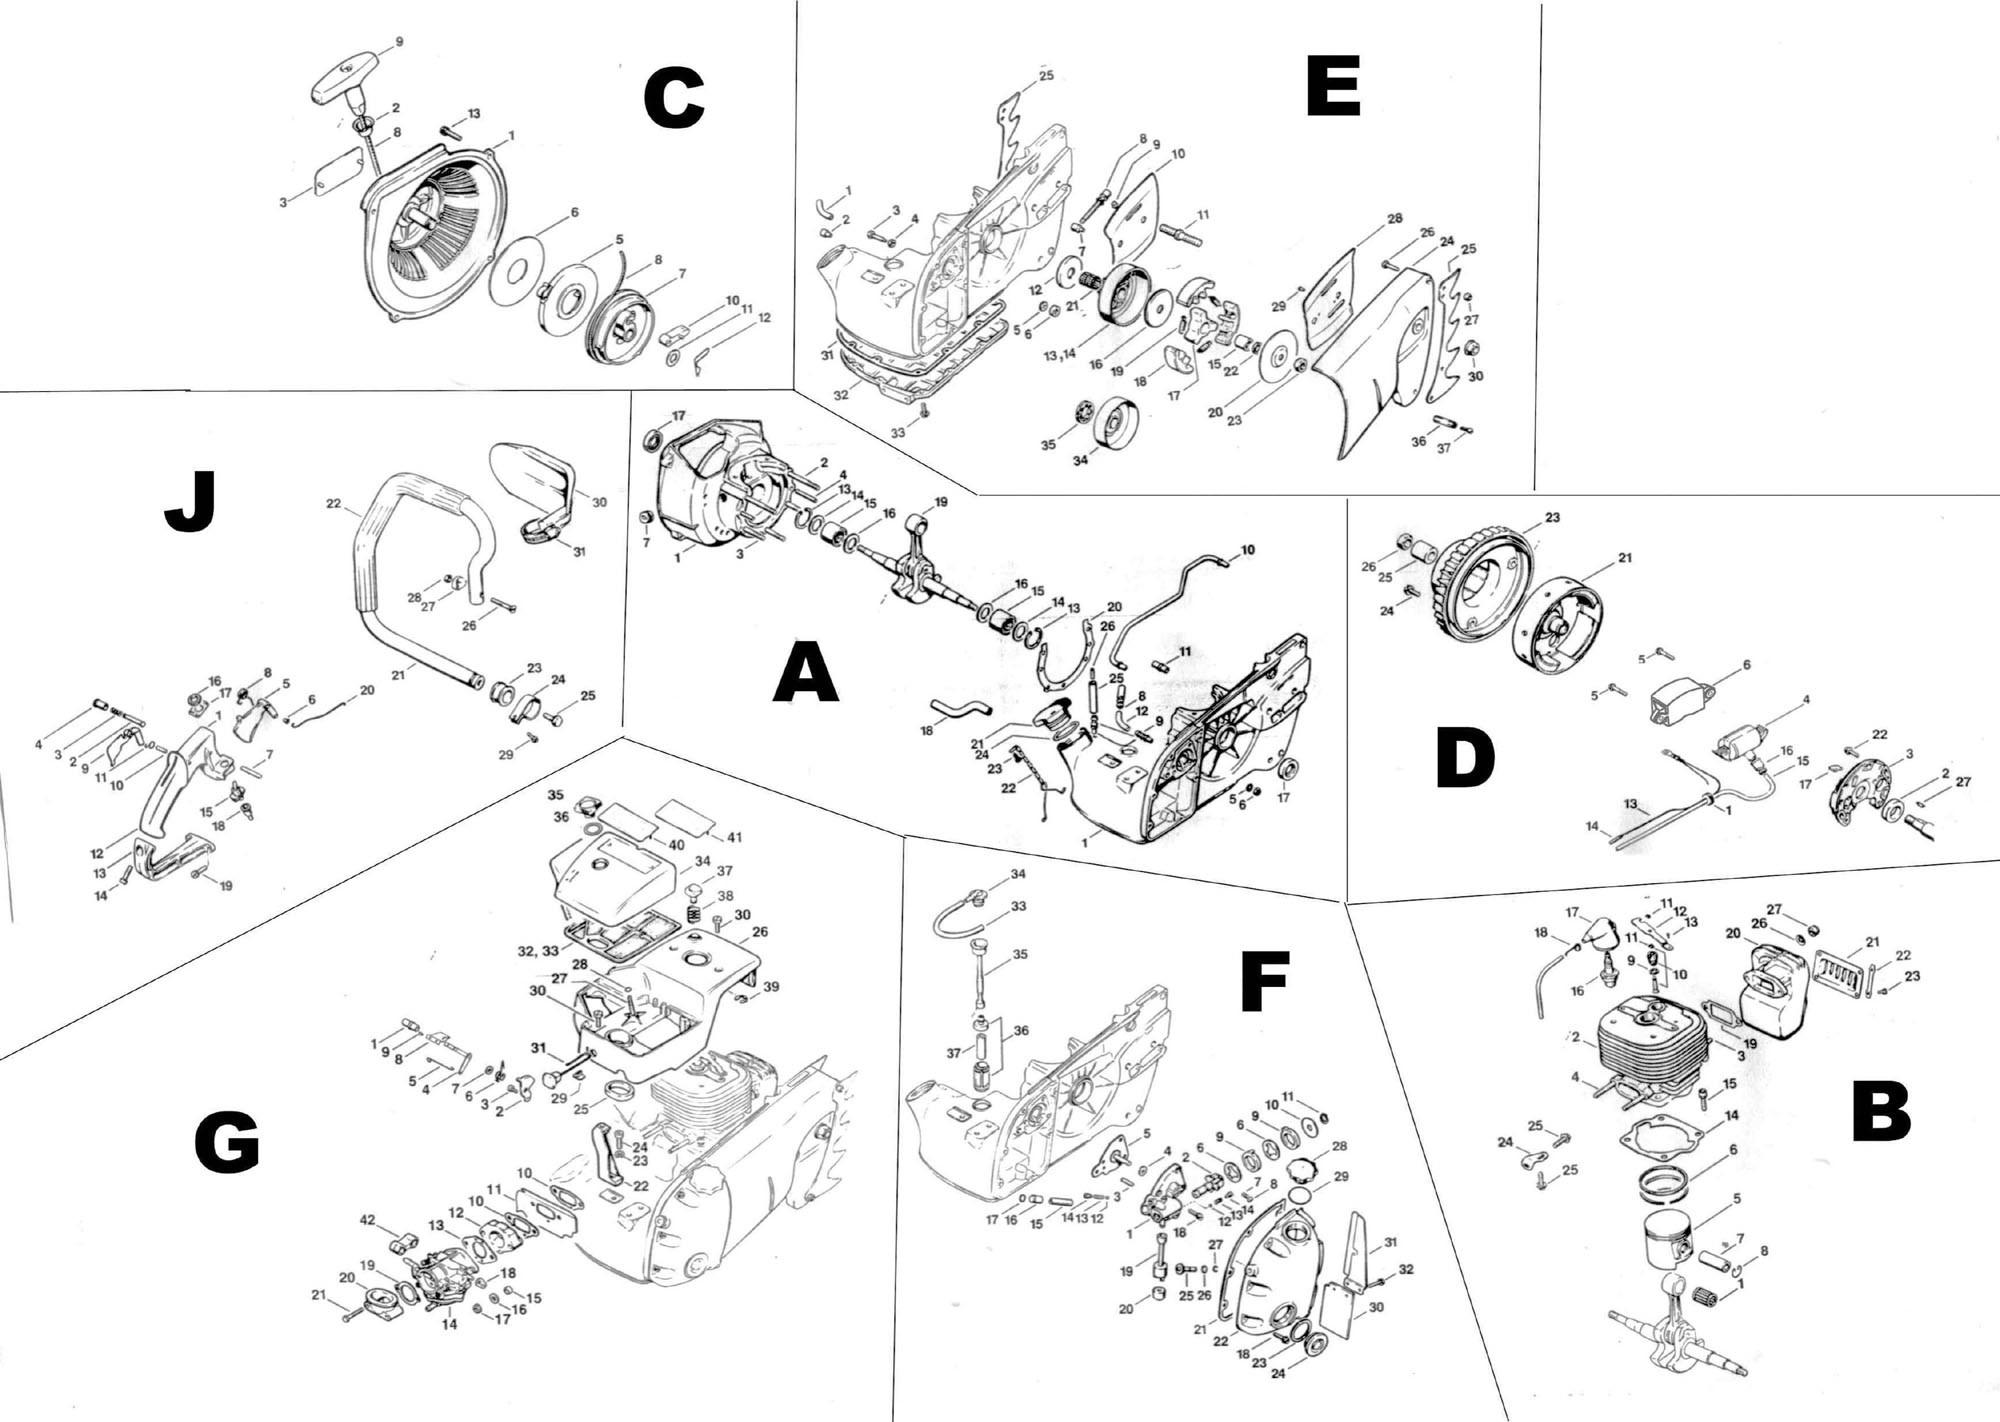 elements of agricultural engineering farm power farm machinery farm processing farm electricity